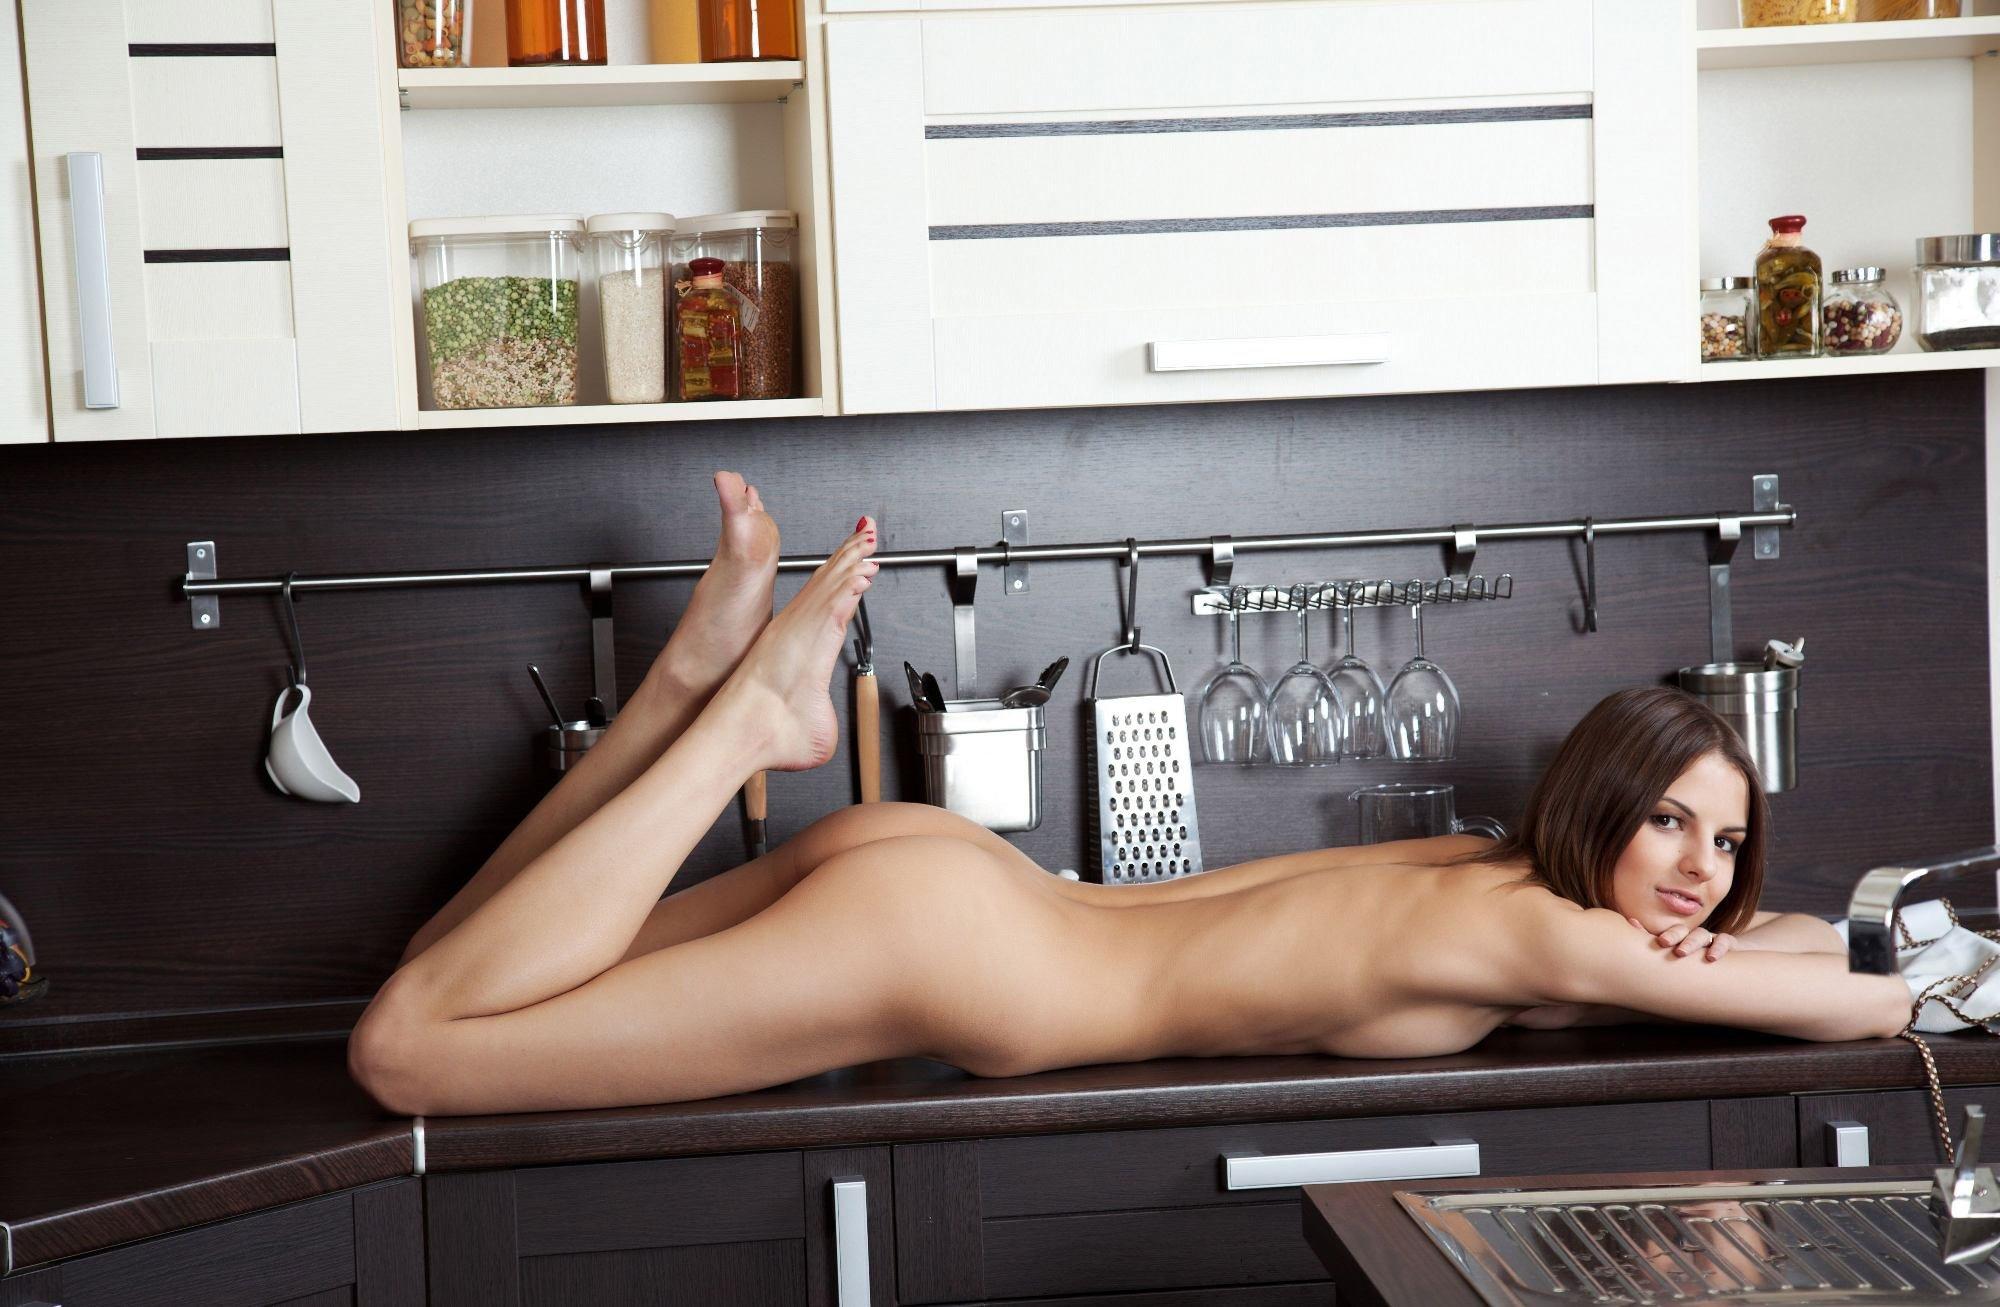 Обнаженные фото девушек на кухне